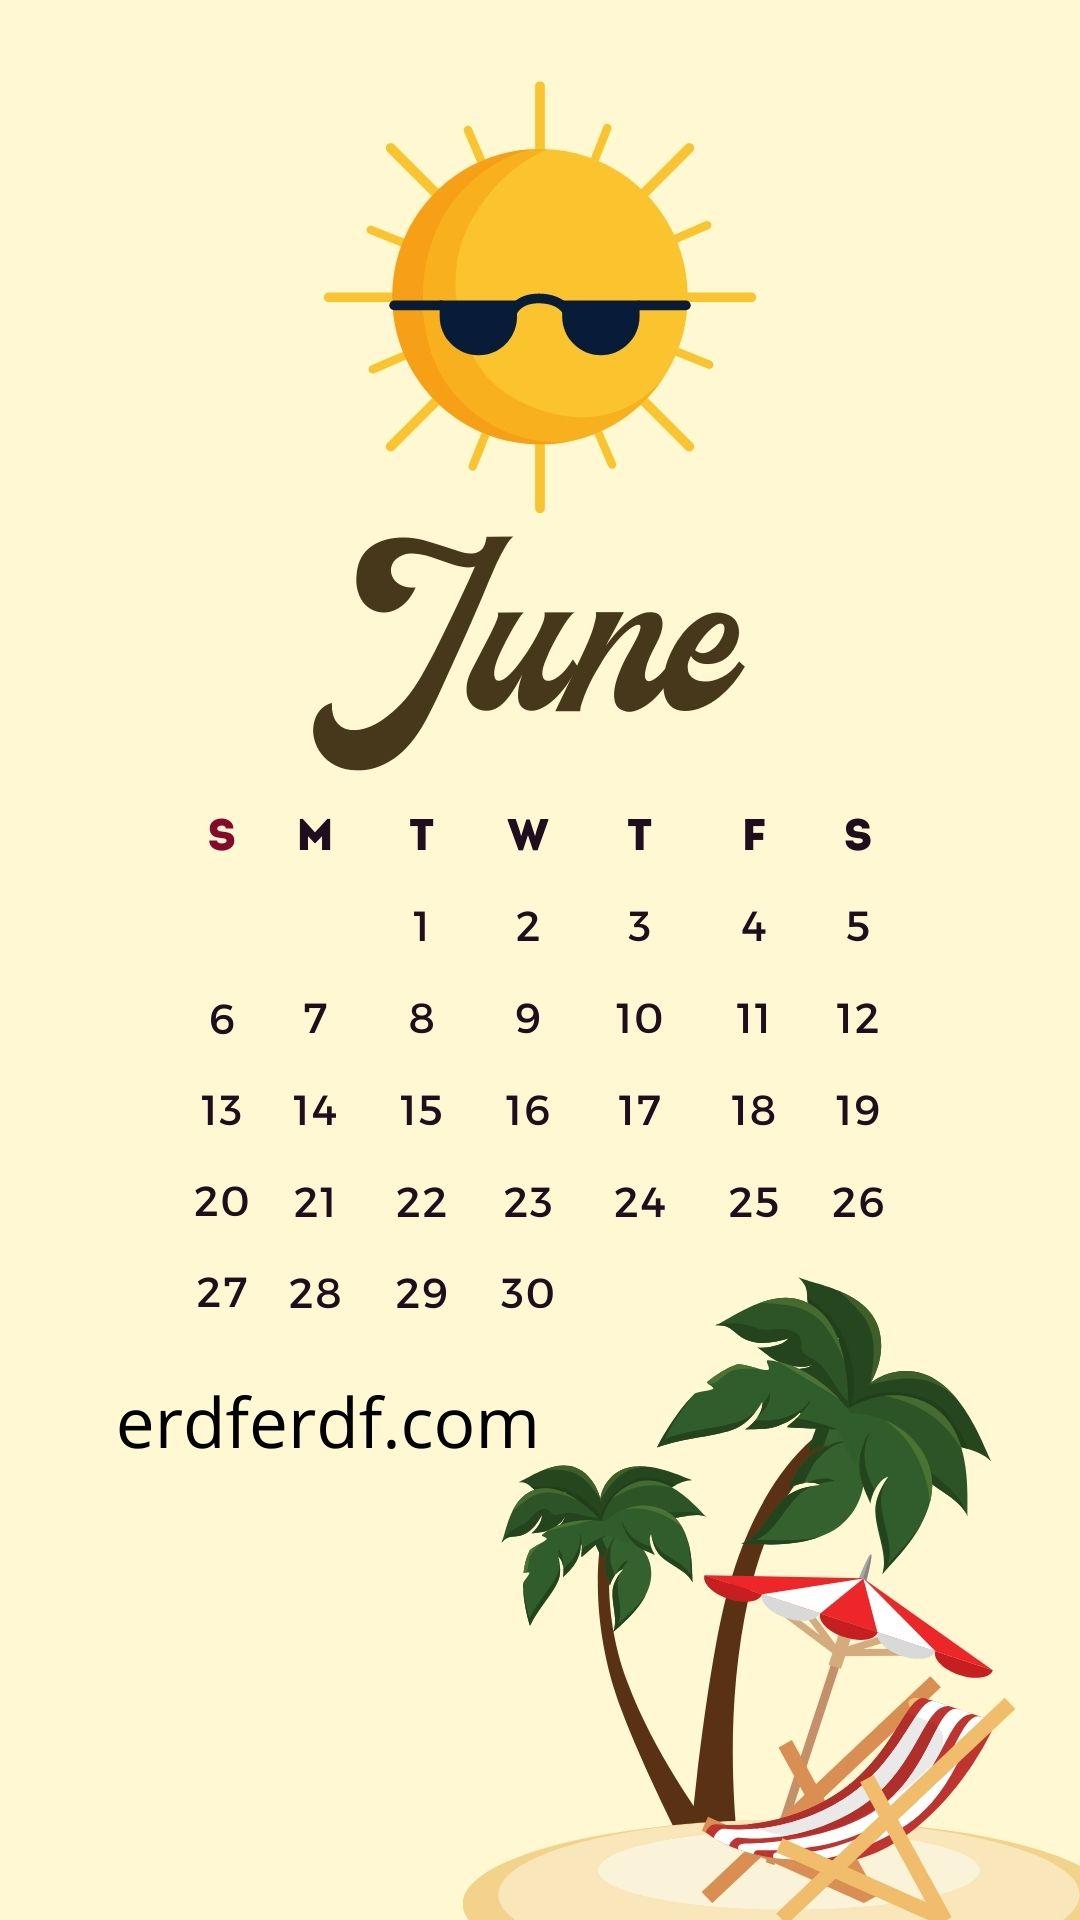 Wallpaper Calendar iPhone 13 june